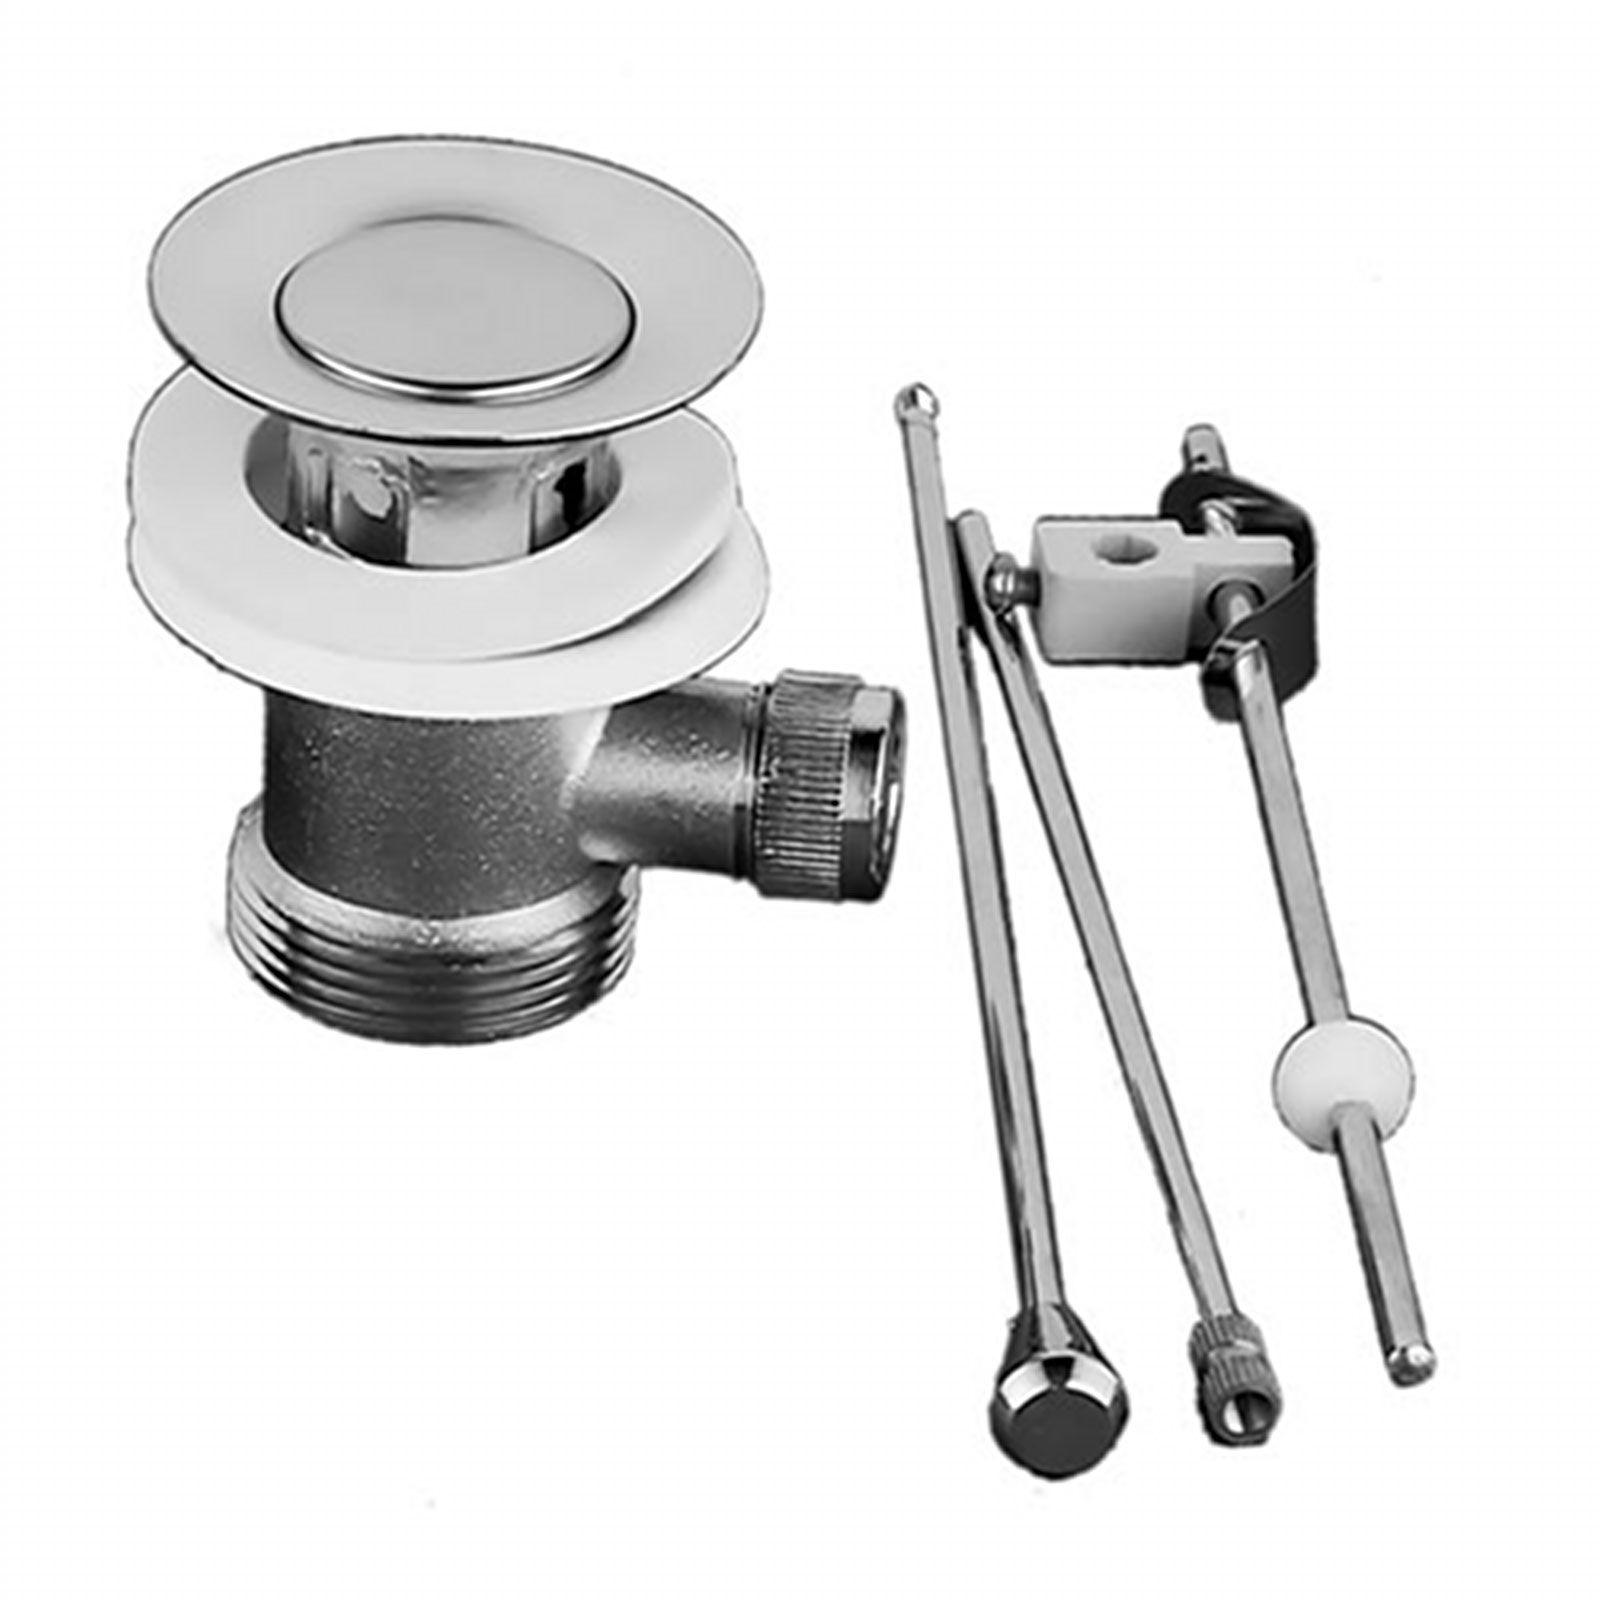 Sink plugs bathroom - B Q Bathroom Sink Plug